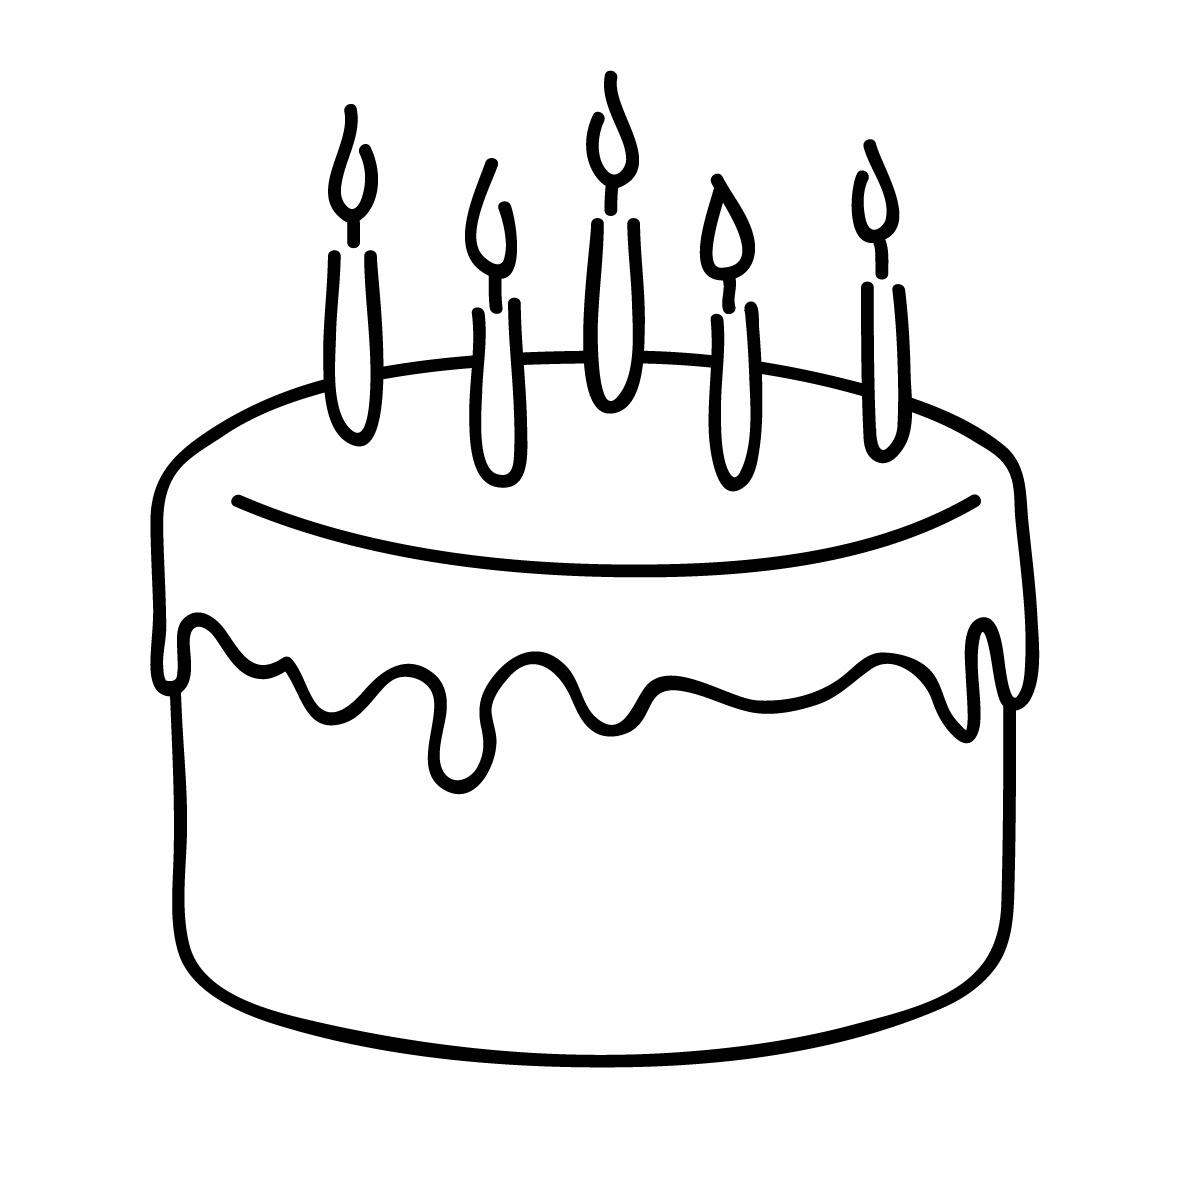 50th Birthday Cake Clipart